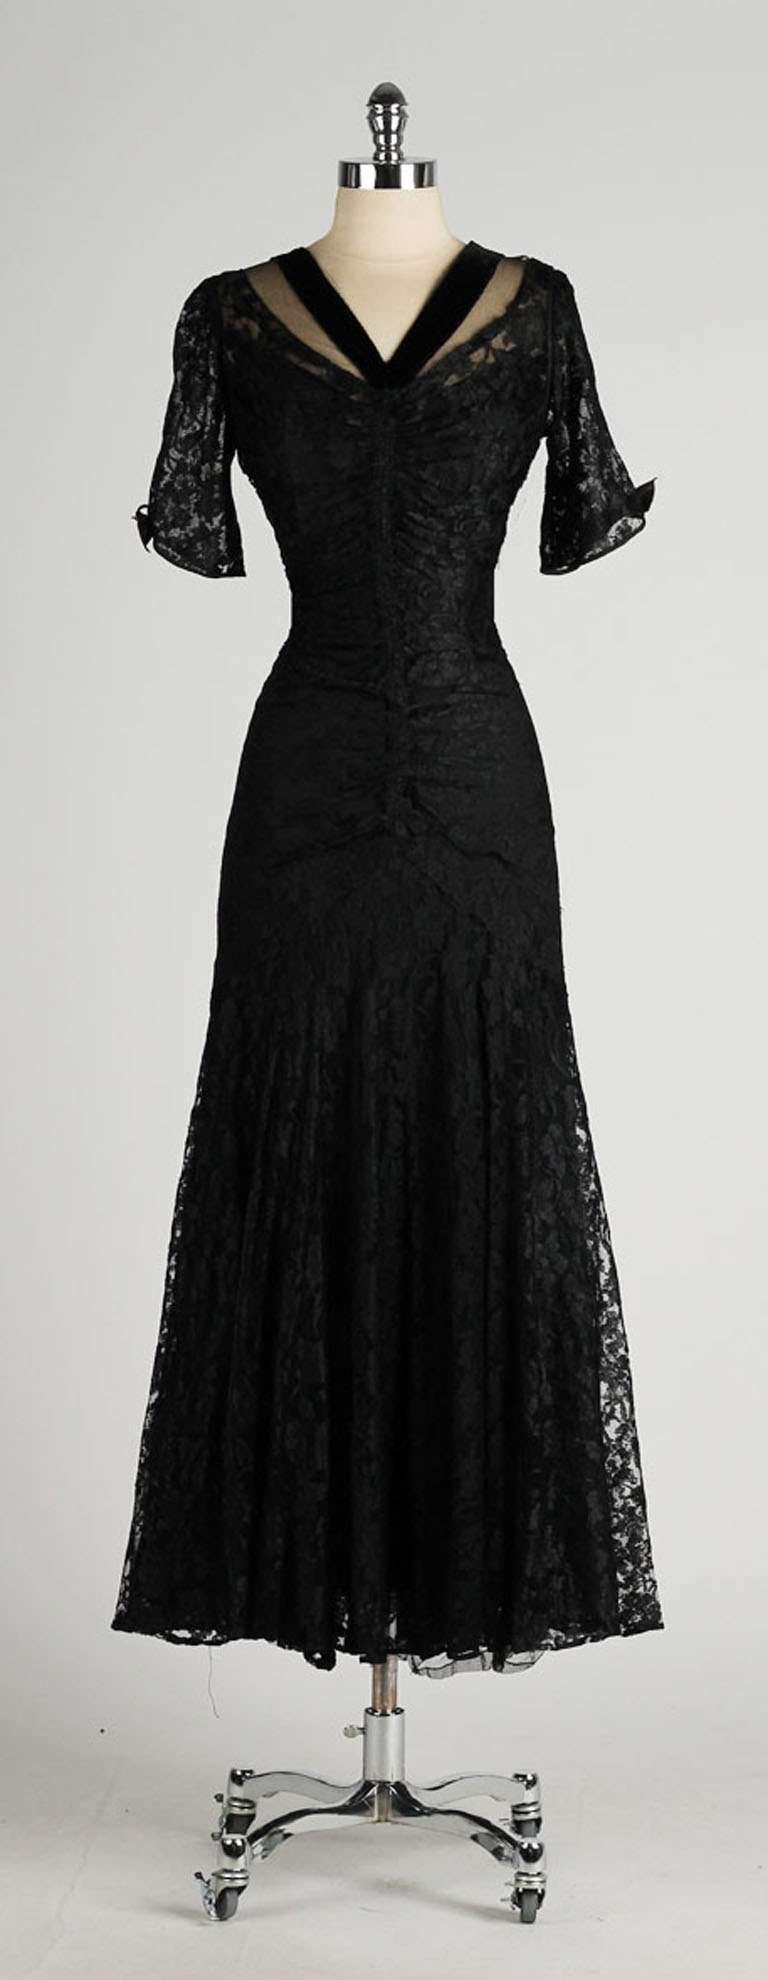 Vintage us black chantilly lace illusion bodice dress